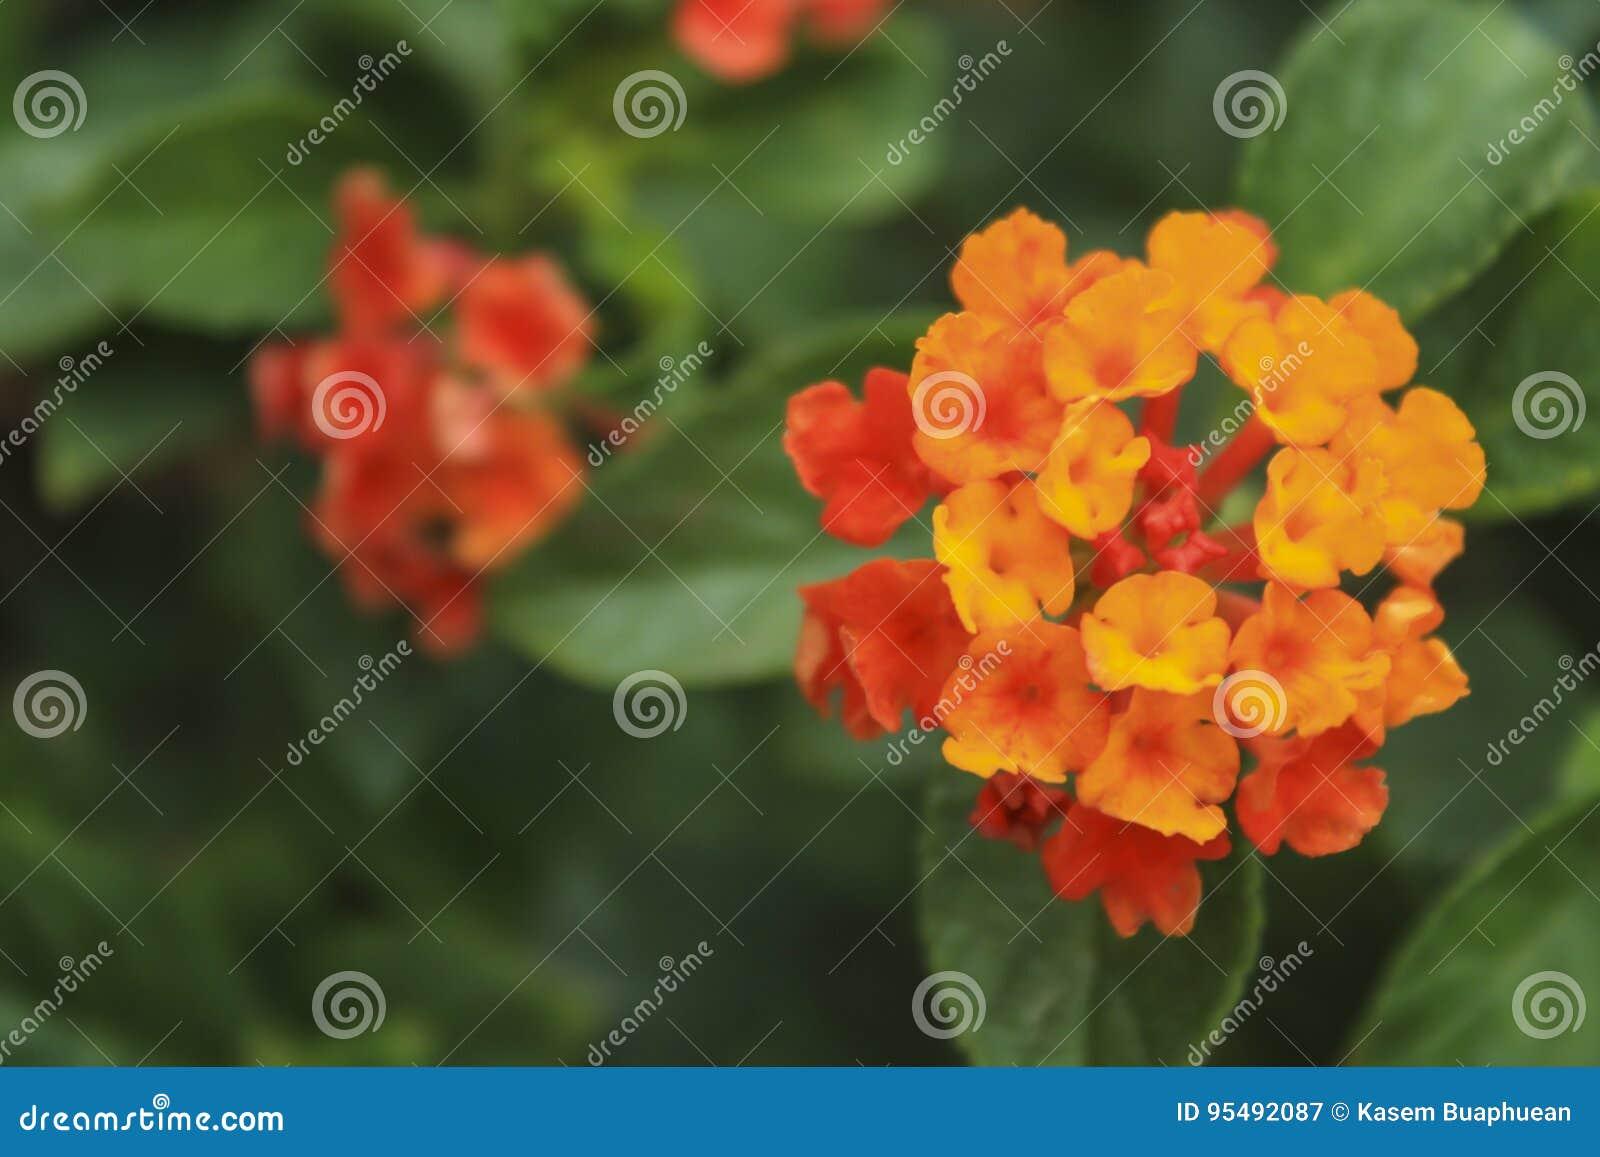 Schöne Bunte Hecken Blume Lantana Weinender Lantana Lantana